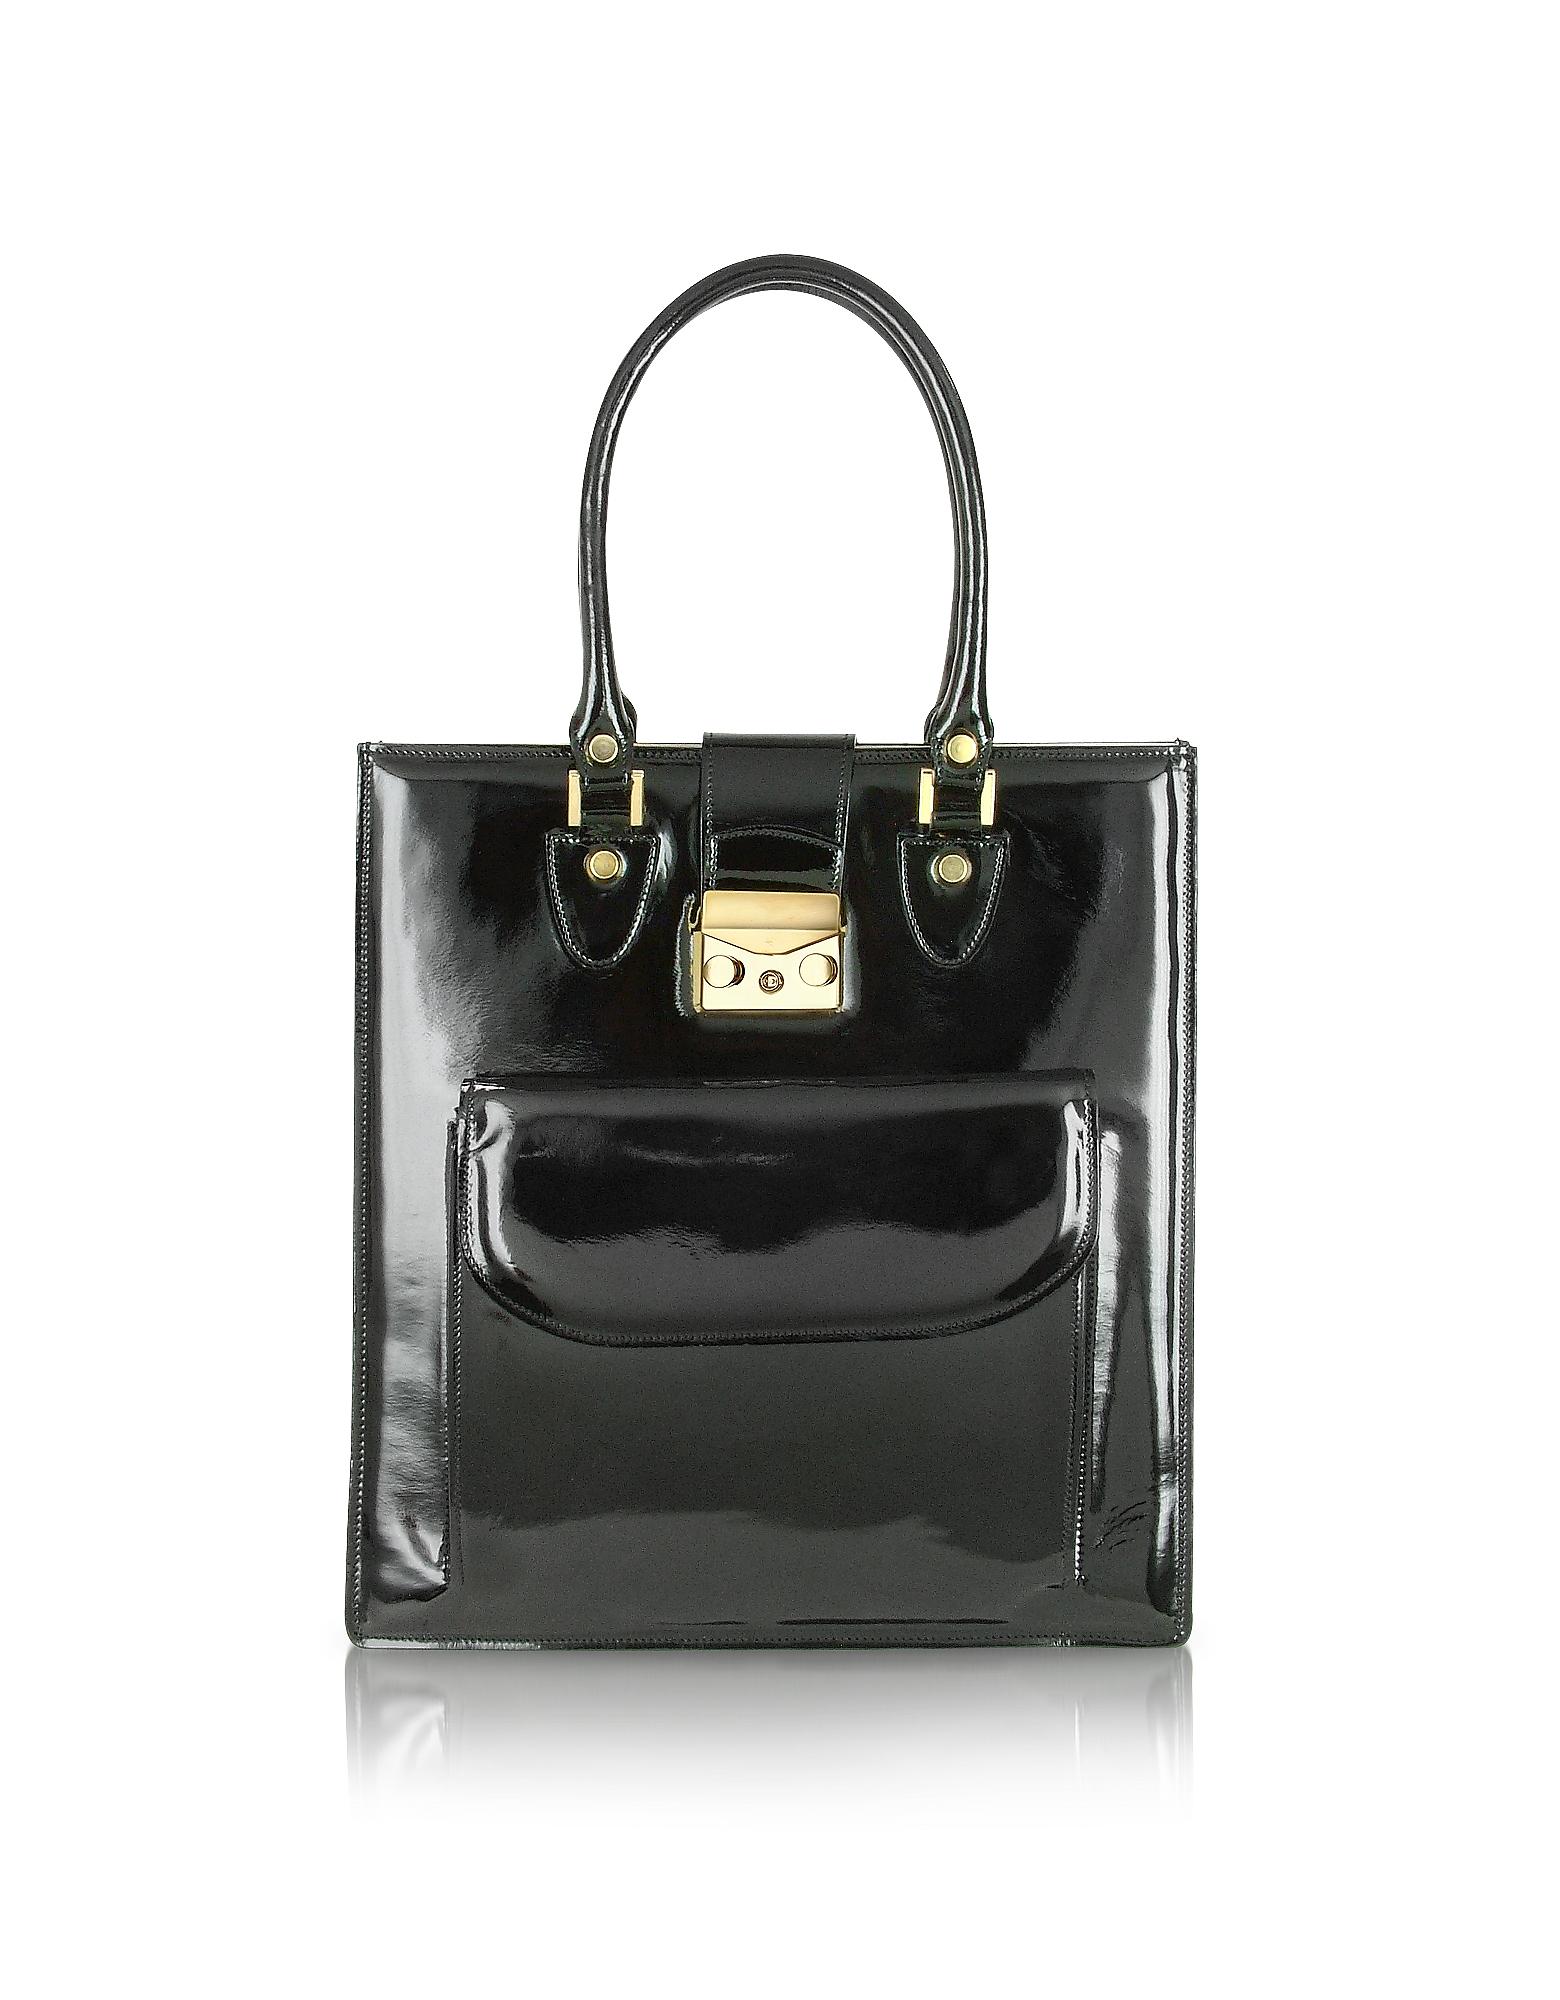 L.A.P.A. Handbags, Black Patent Leather Tote Bag